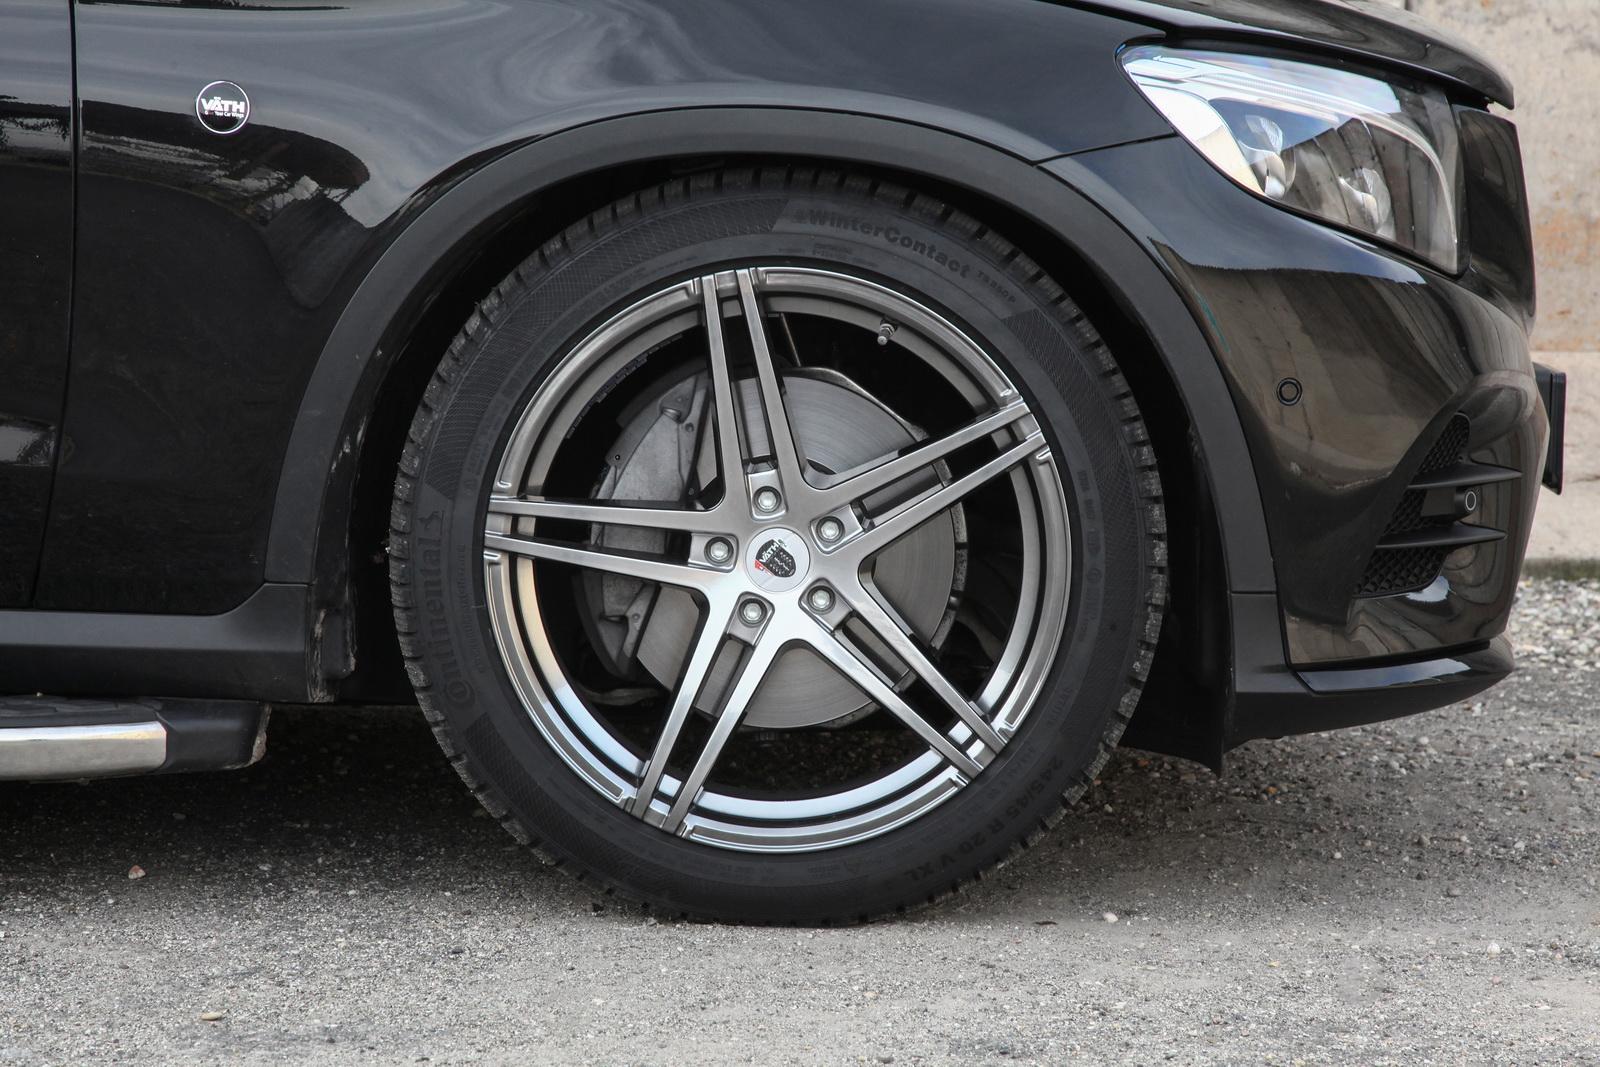 Mercedes_GLC220d_by_Vath_03